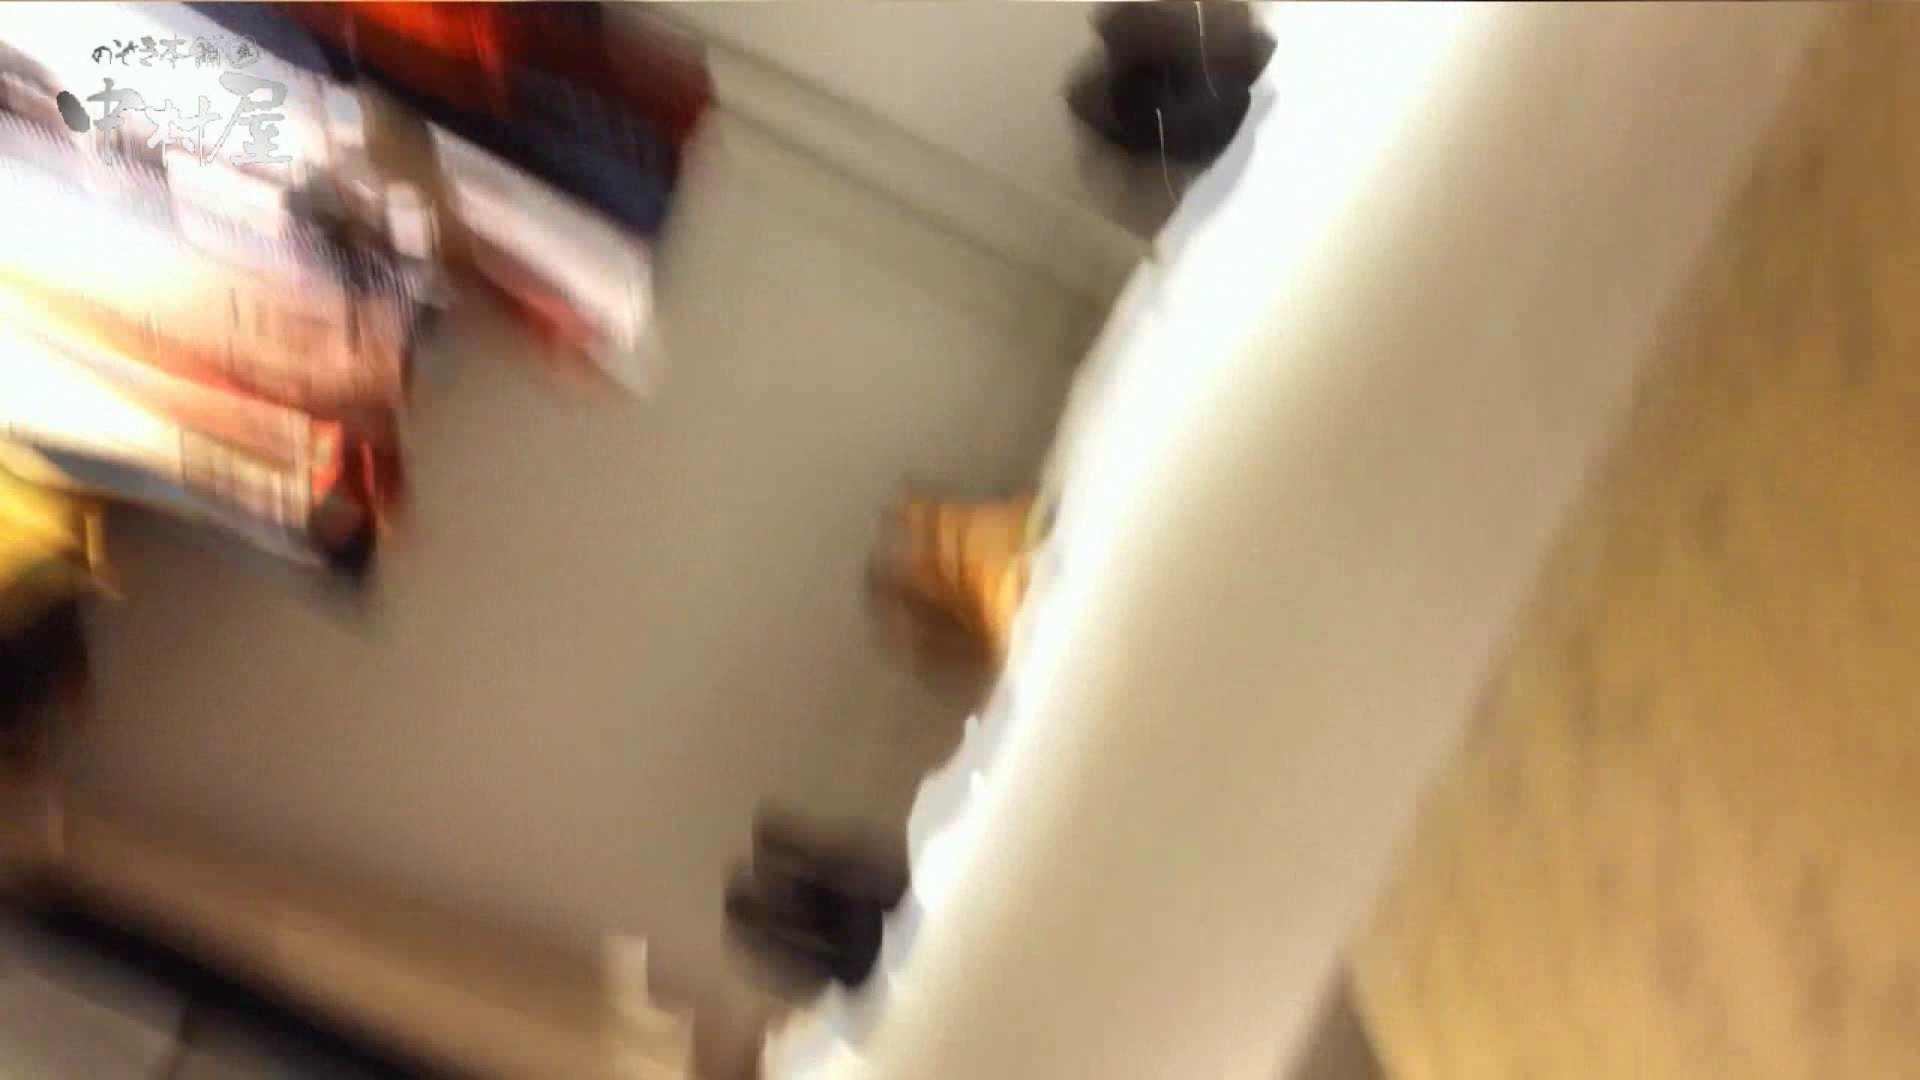 vol.84 美人アパレル胸チラ&パンチラ 帽子オネェさんに胸元アタック! 接写  94連発 22